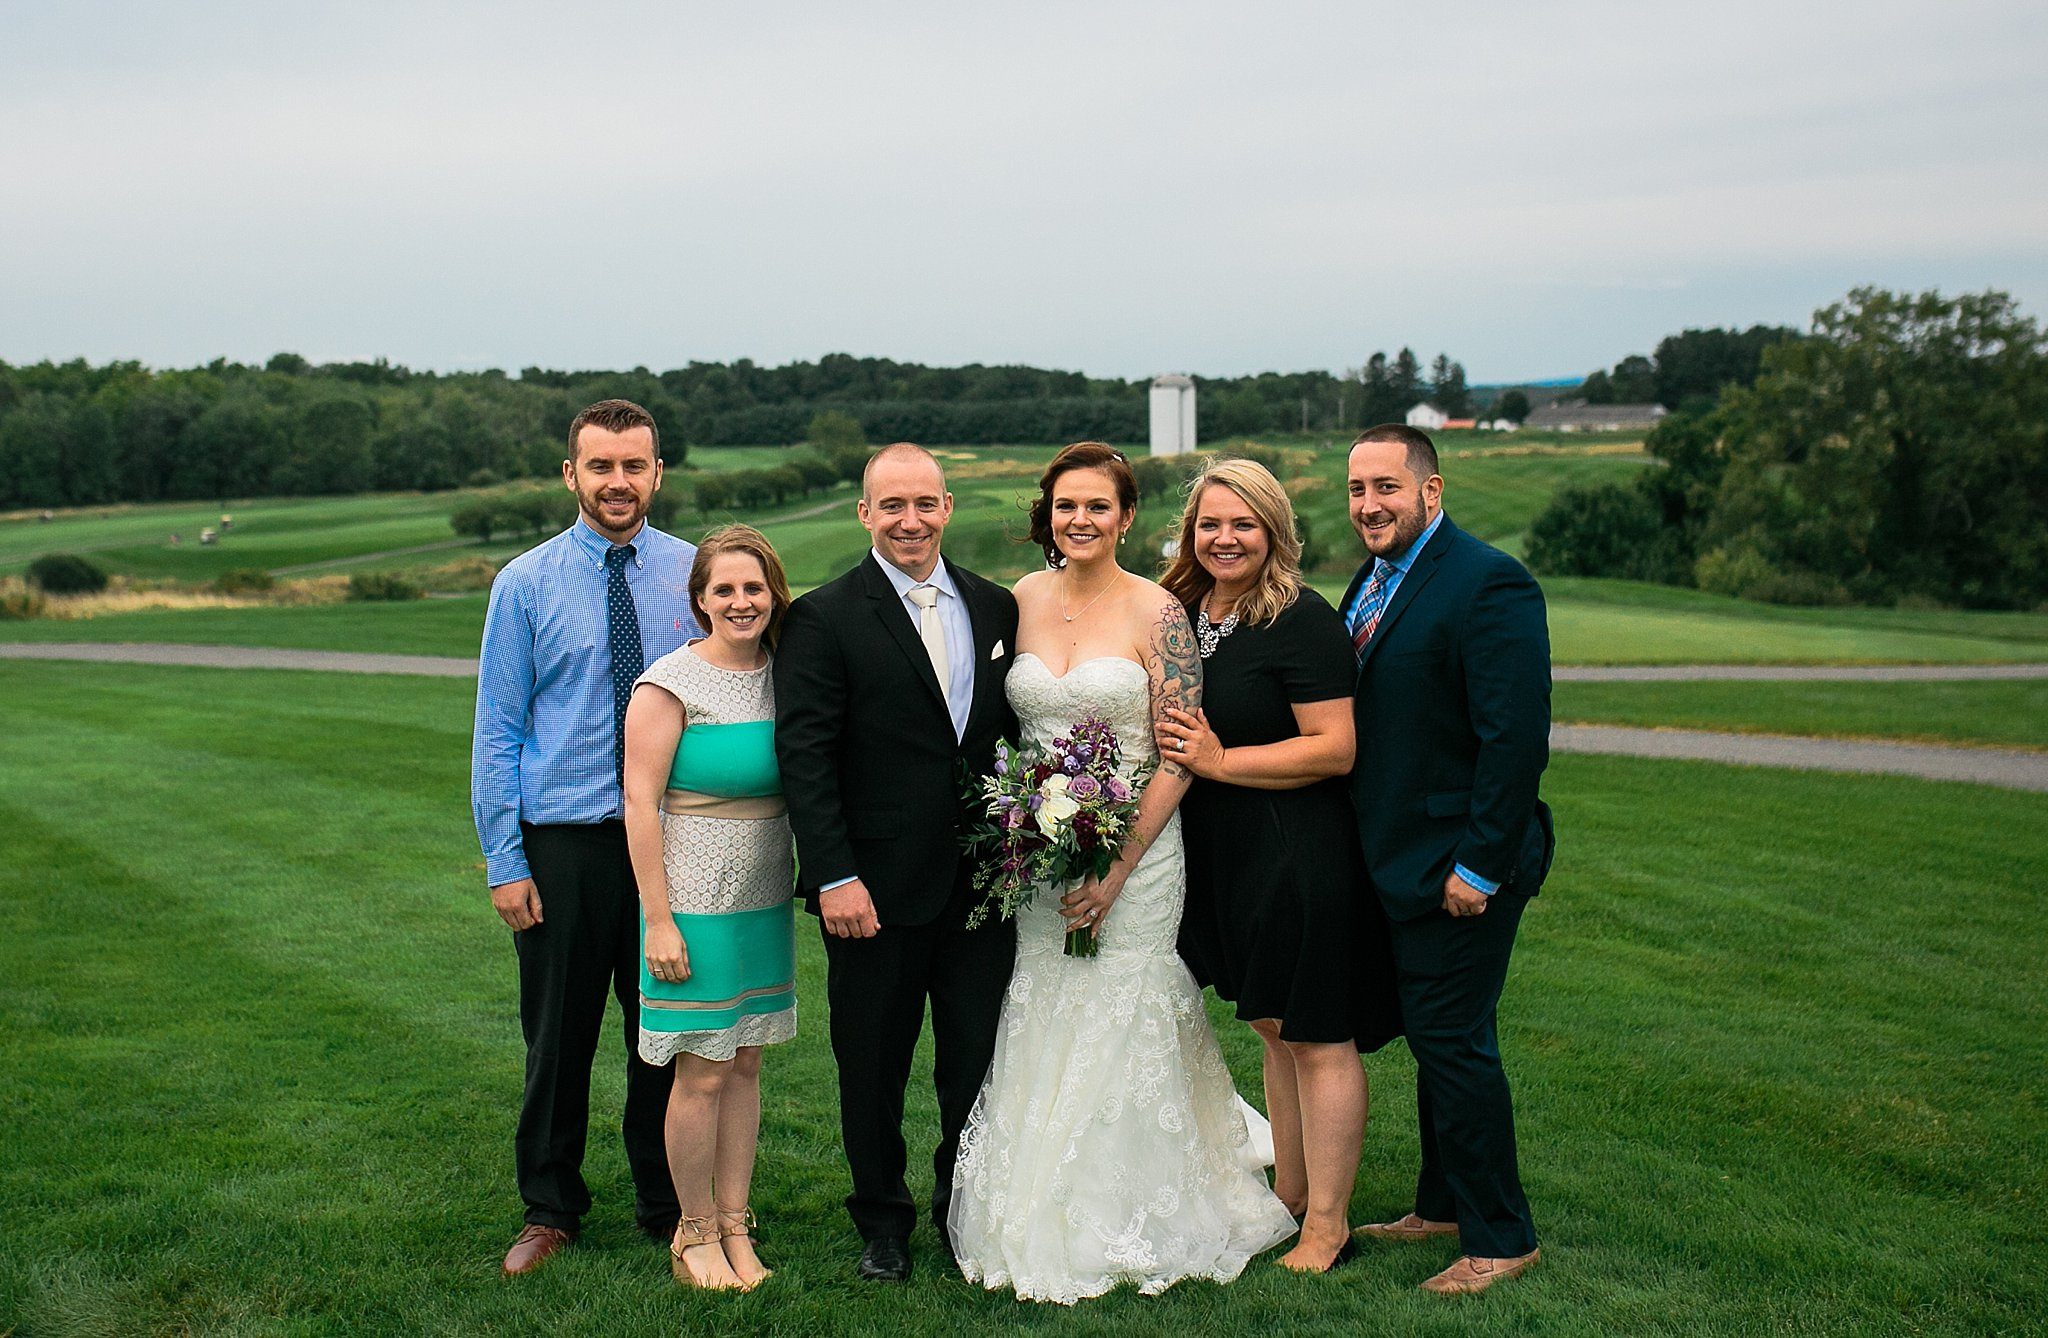 Links at Unionvale Wedding Lagrangeville Wedding Hudson Valley Wedding Photographer Sweet Alice Photography62.jpg